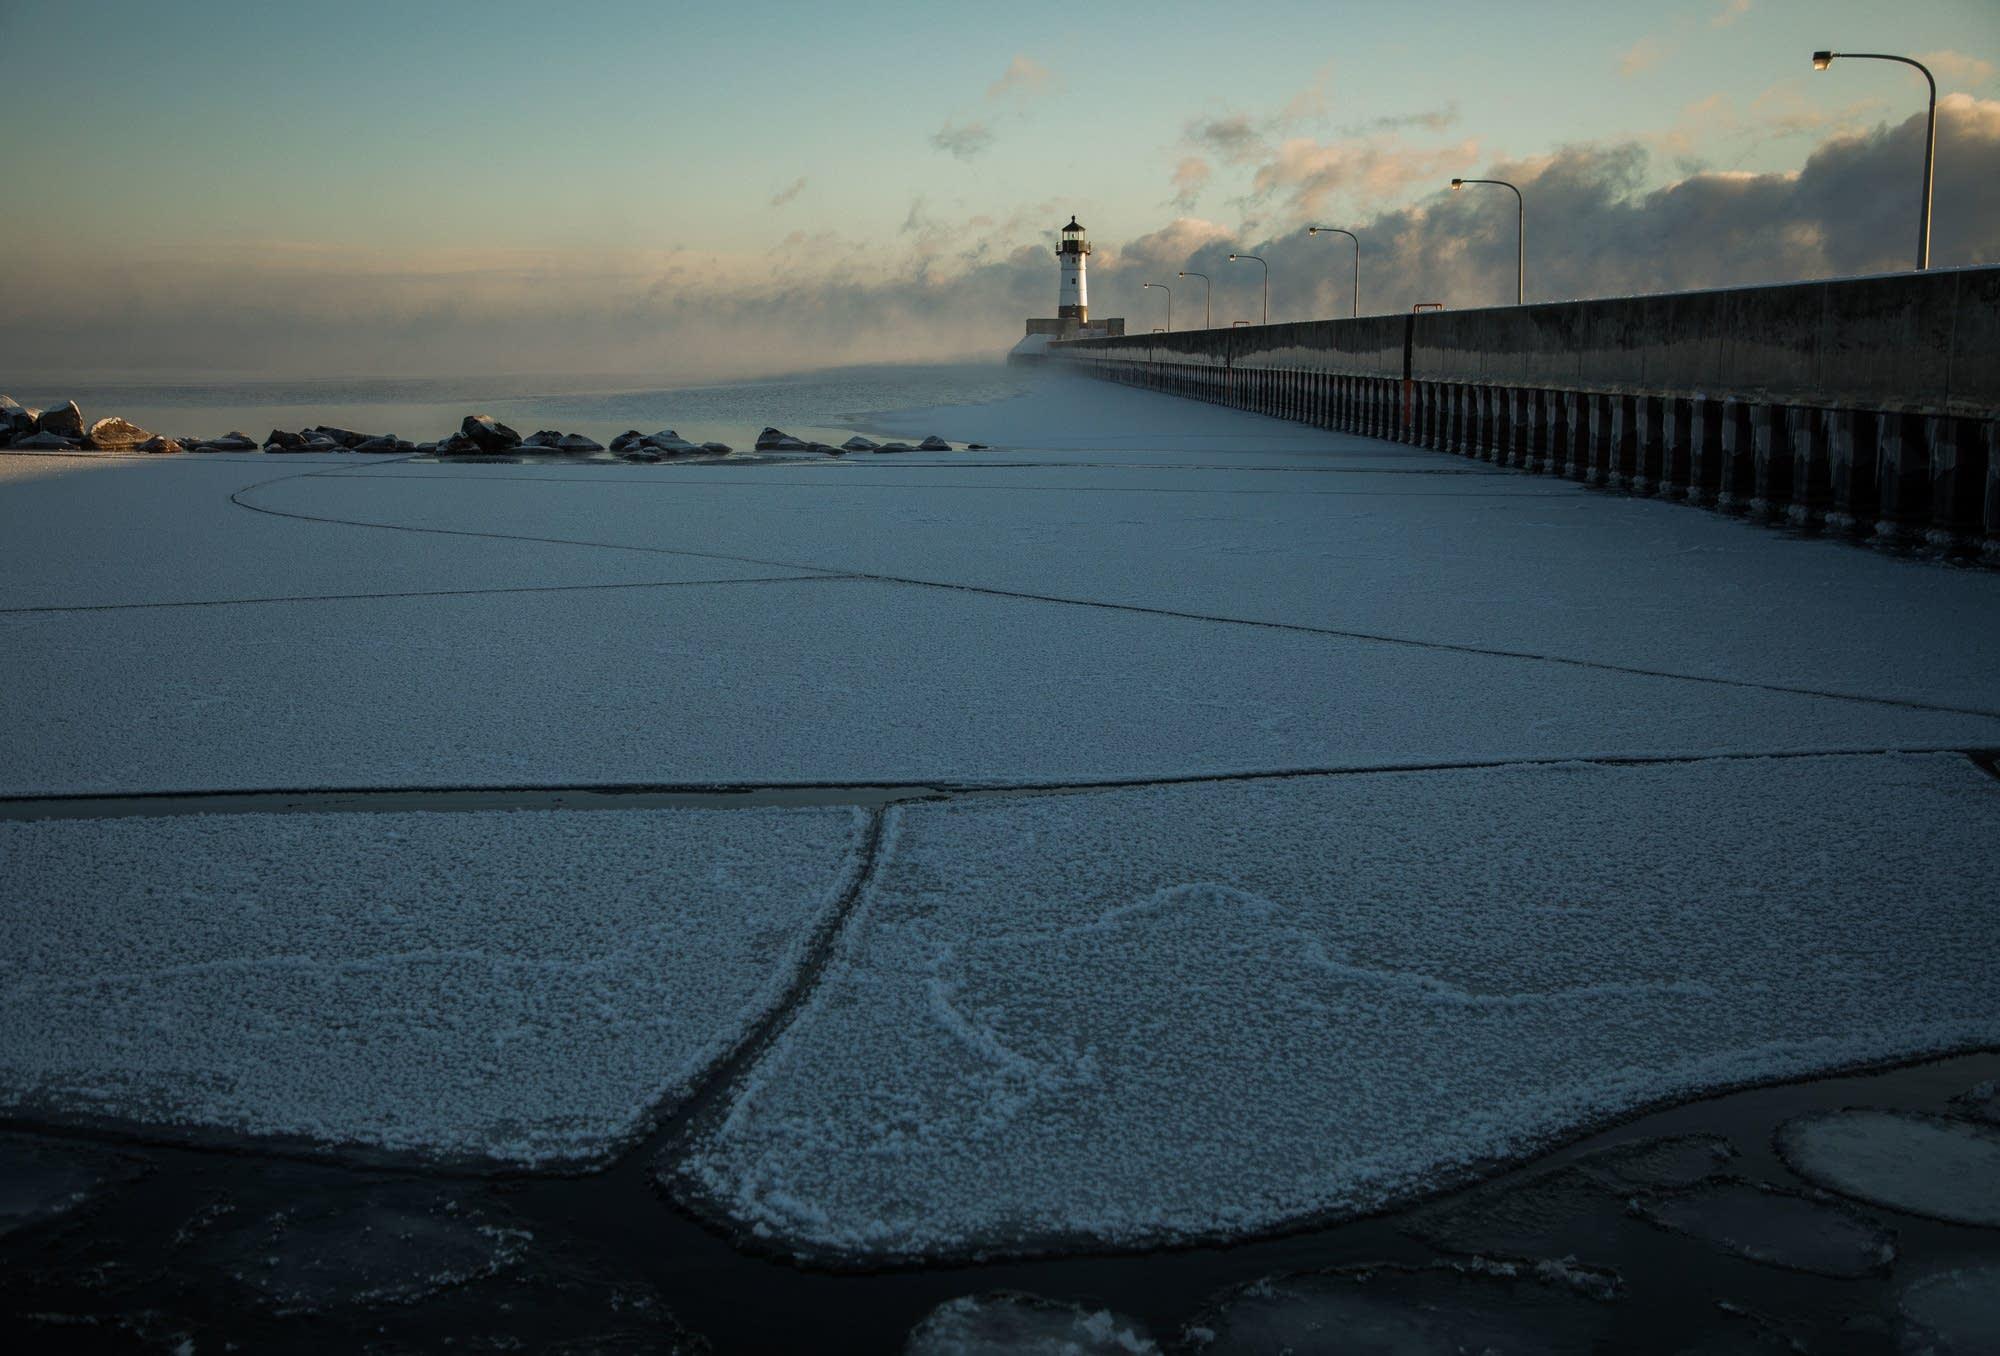 Pancake ice forms along the shoreline while sea smoke rises.